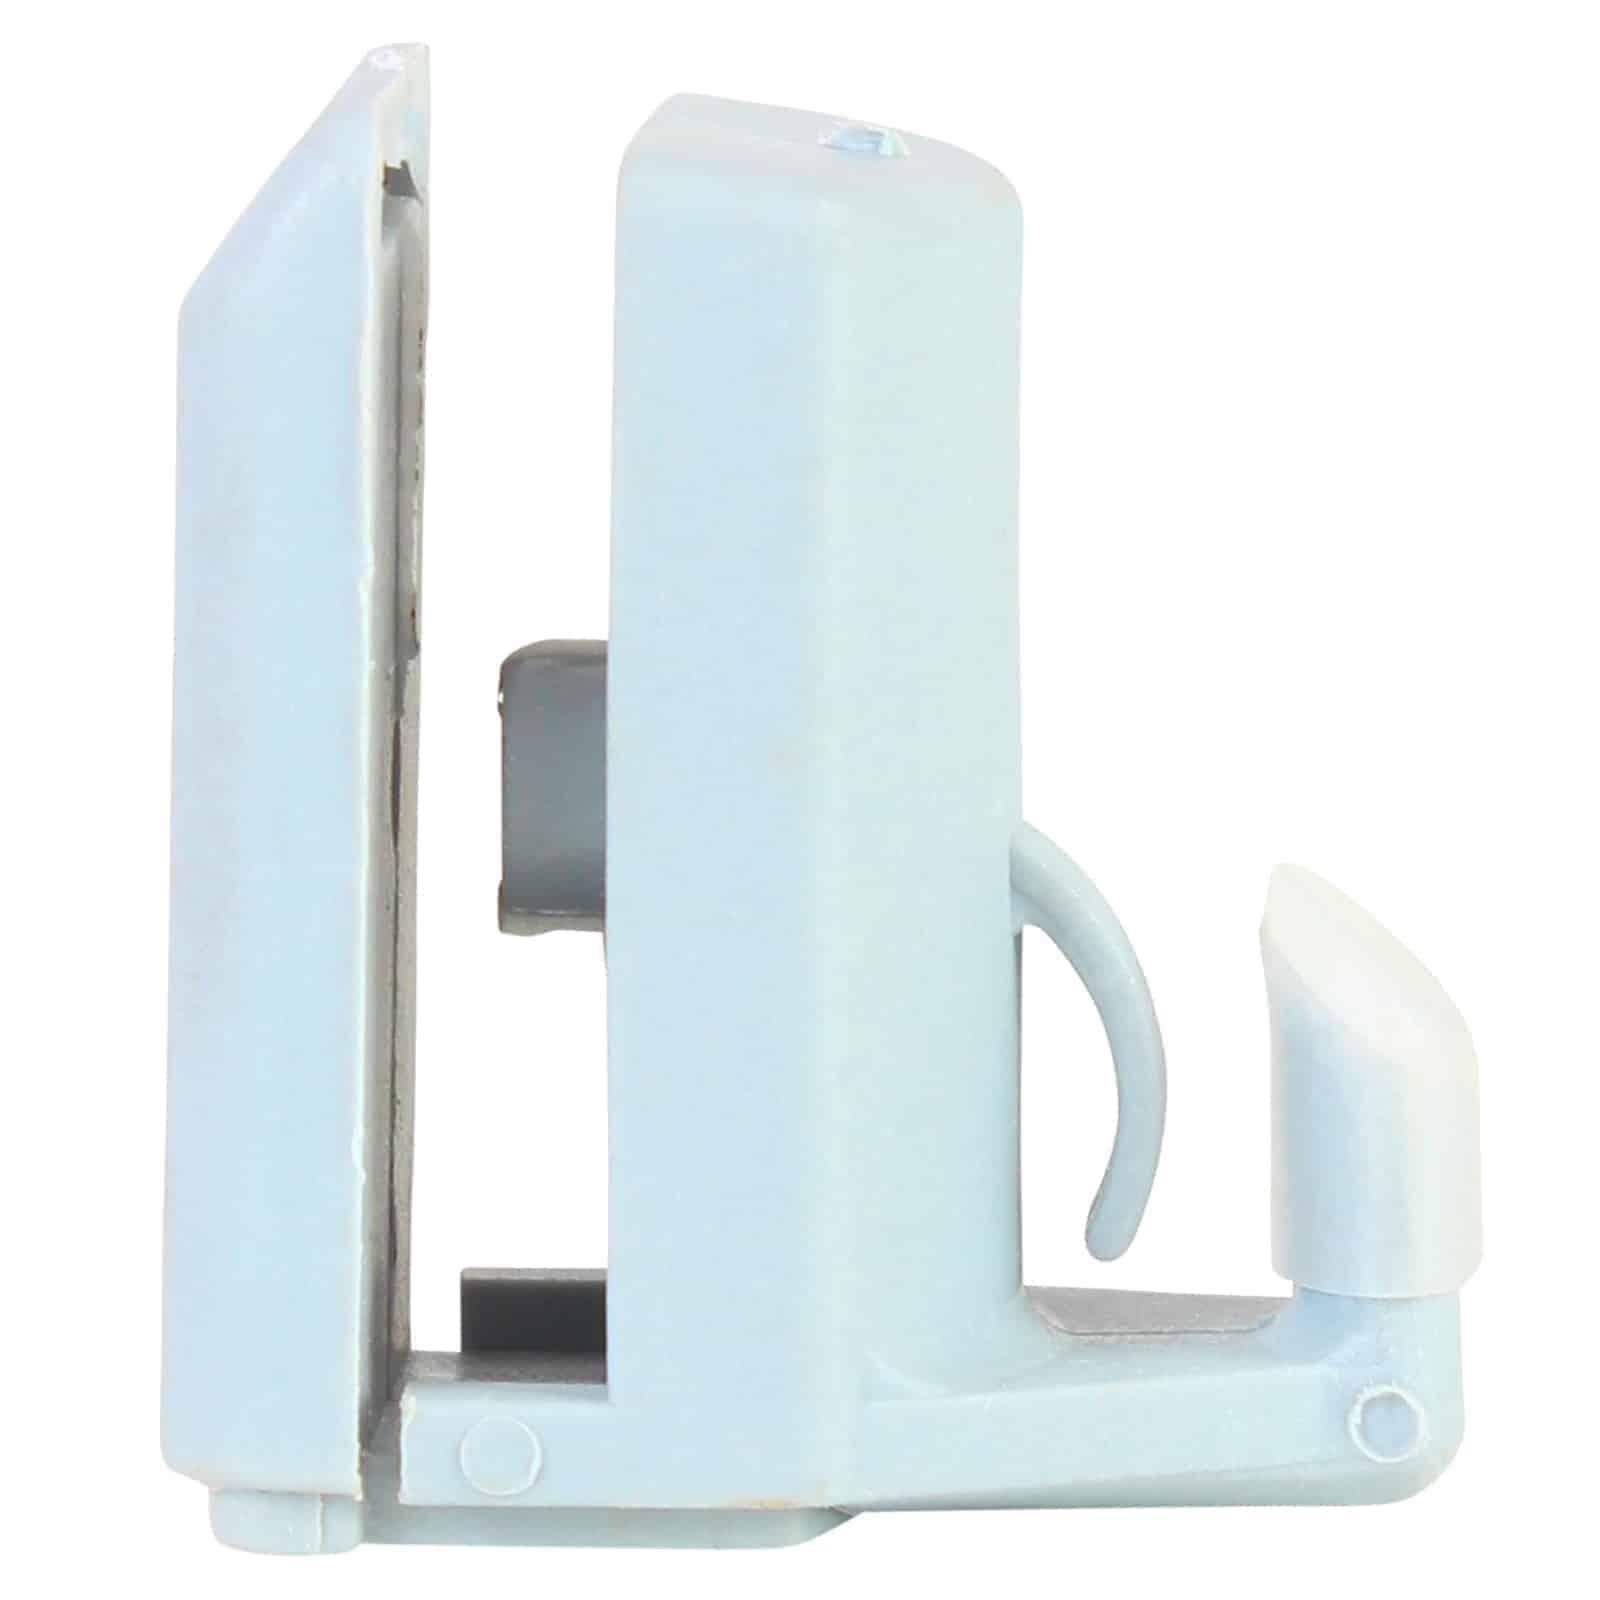 Shower Door Hook Runner Model 003 Shower Parts Amp Spares